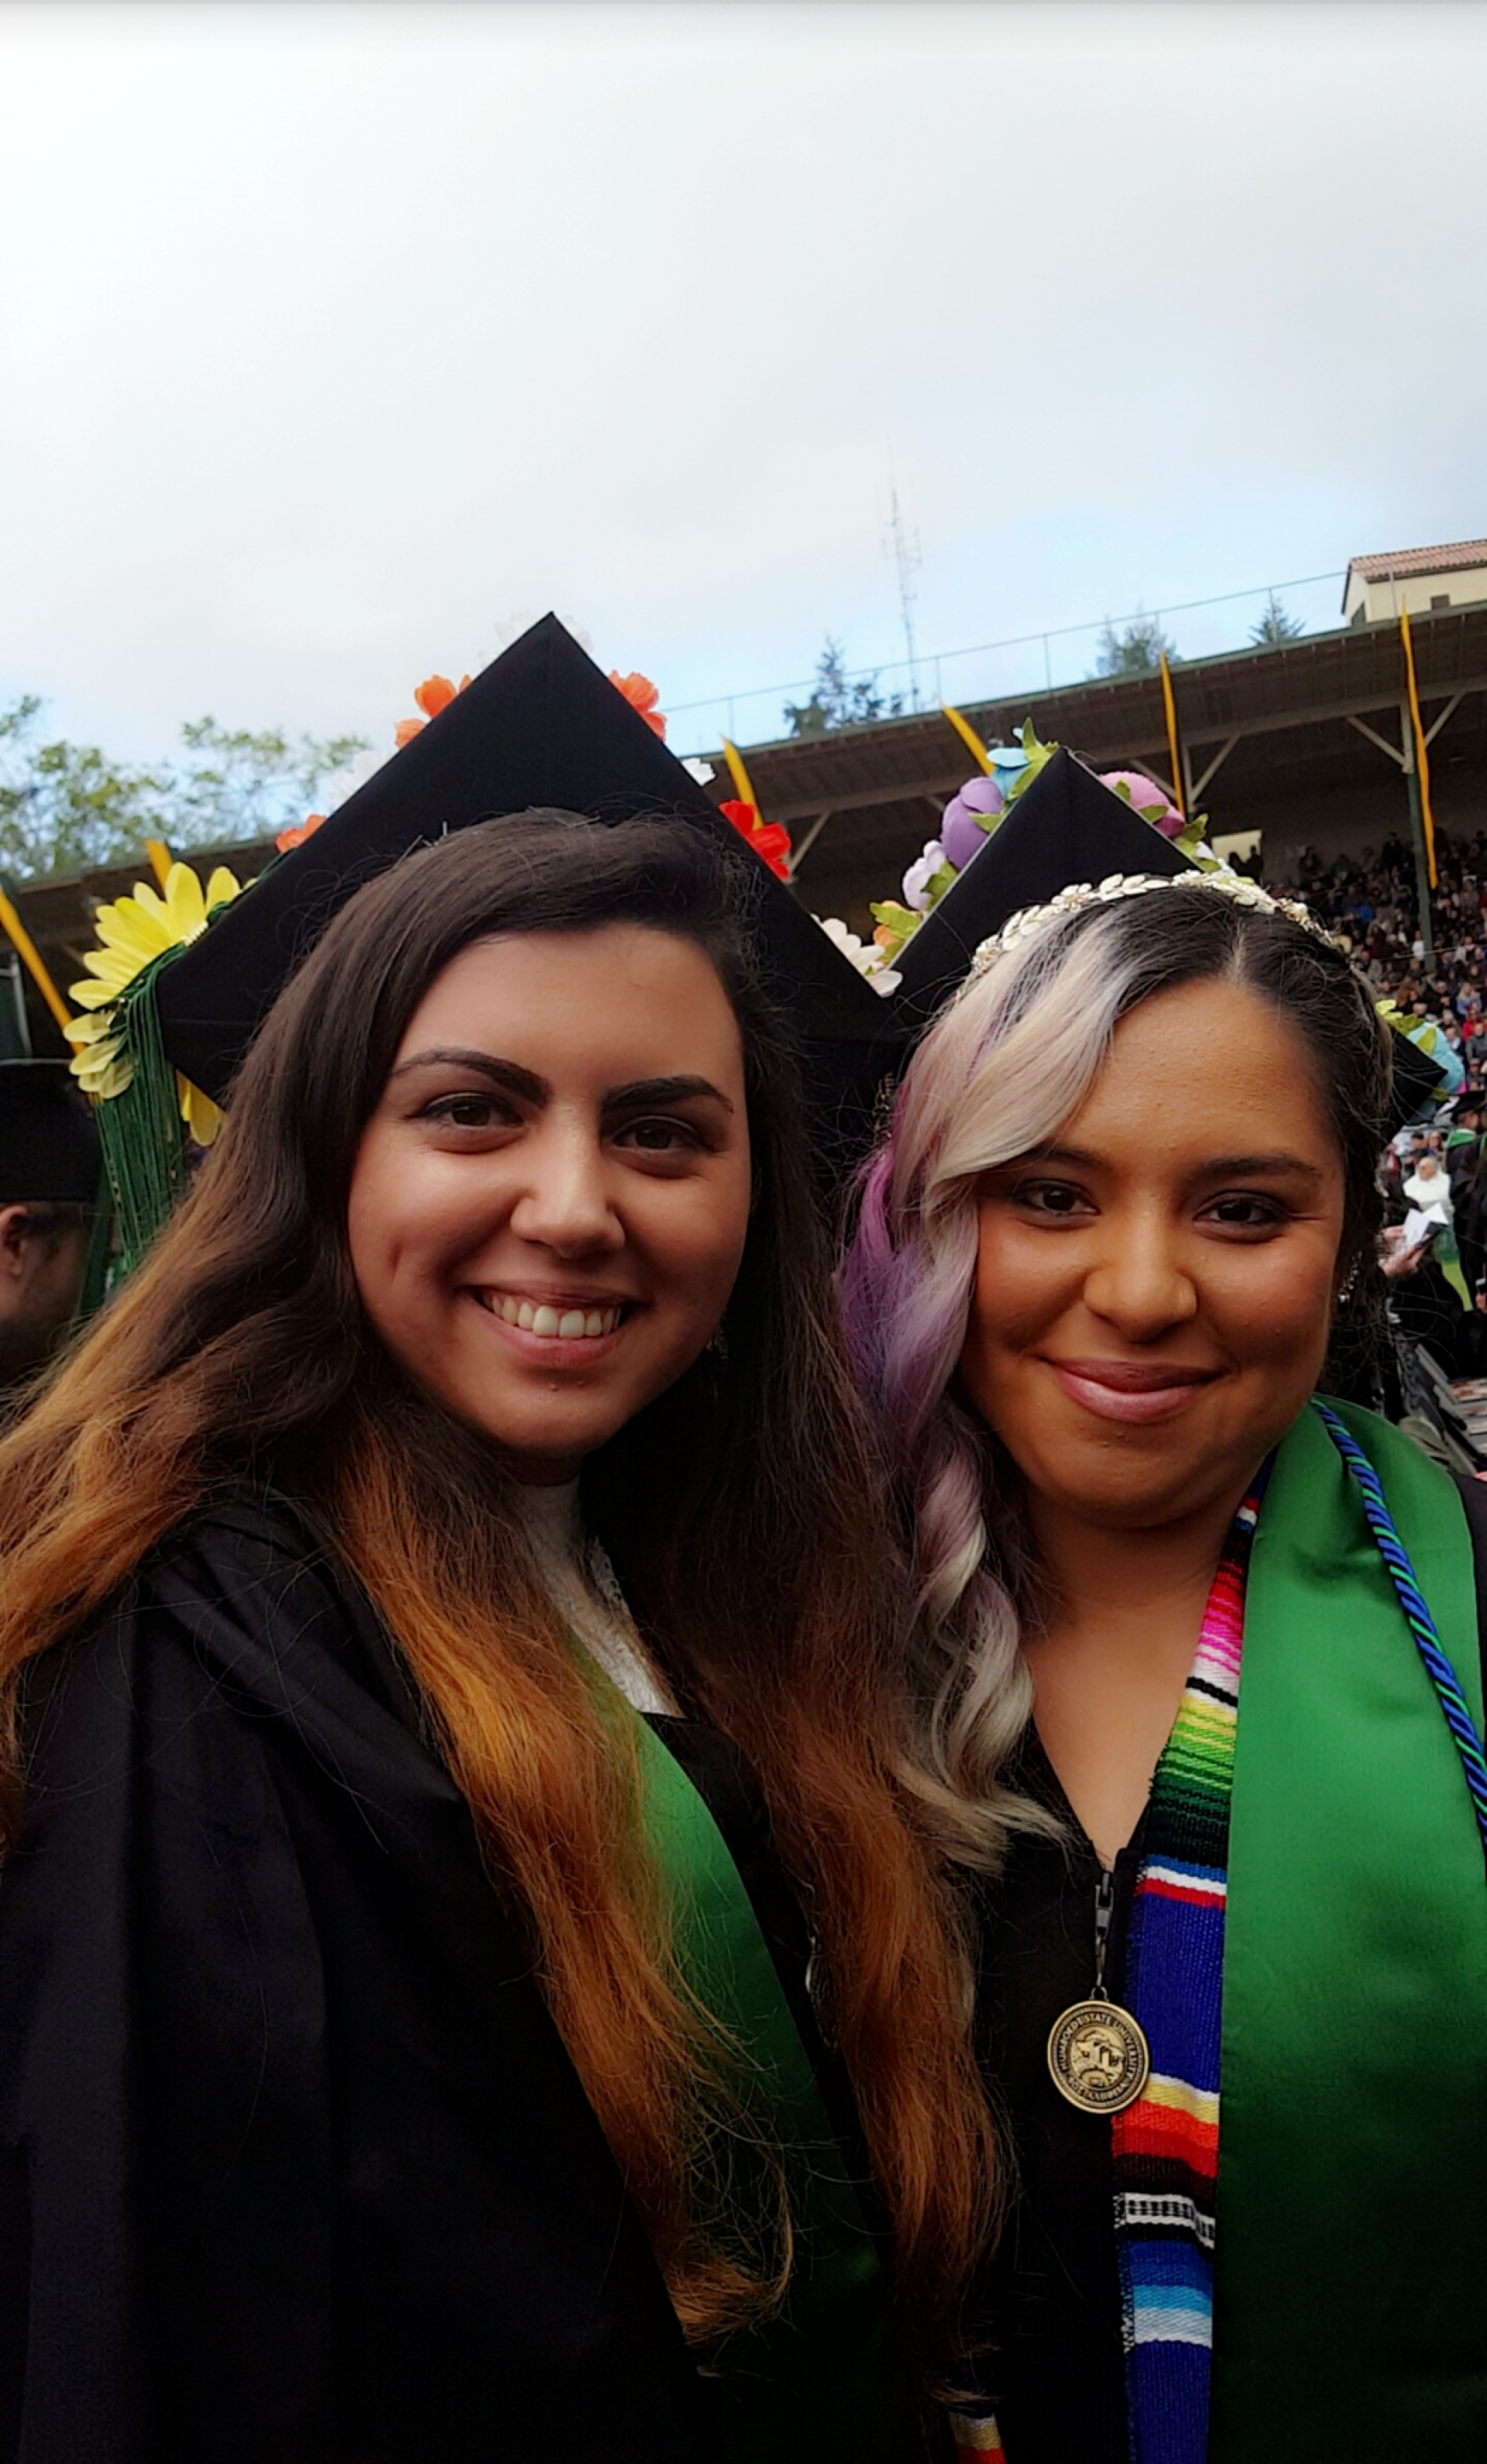 Dezi Villagomez and Josefina Bobadilla during the graduation ceremony last spring 2017.